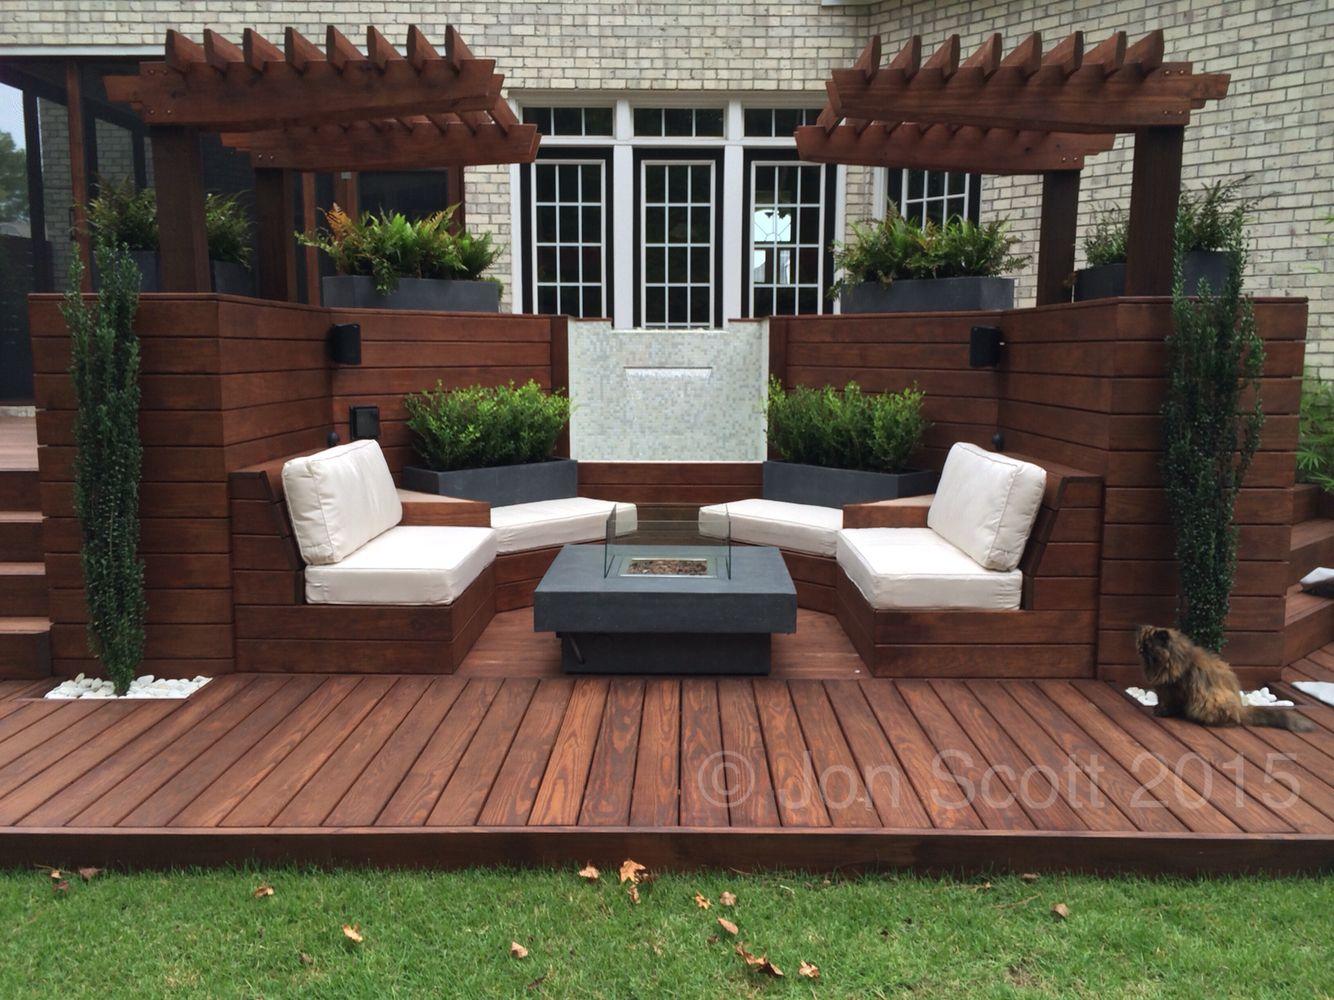 18+ Backyard and deck ideas ideas in 2021